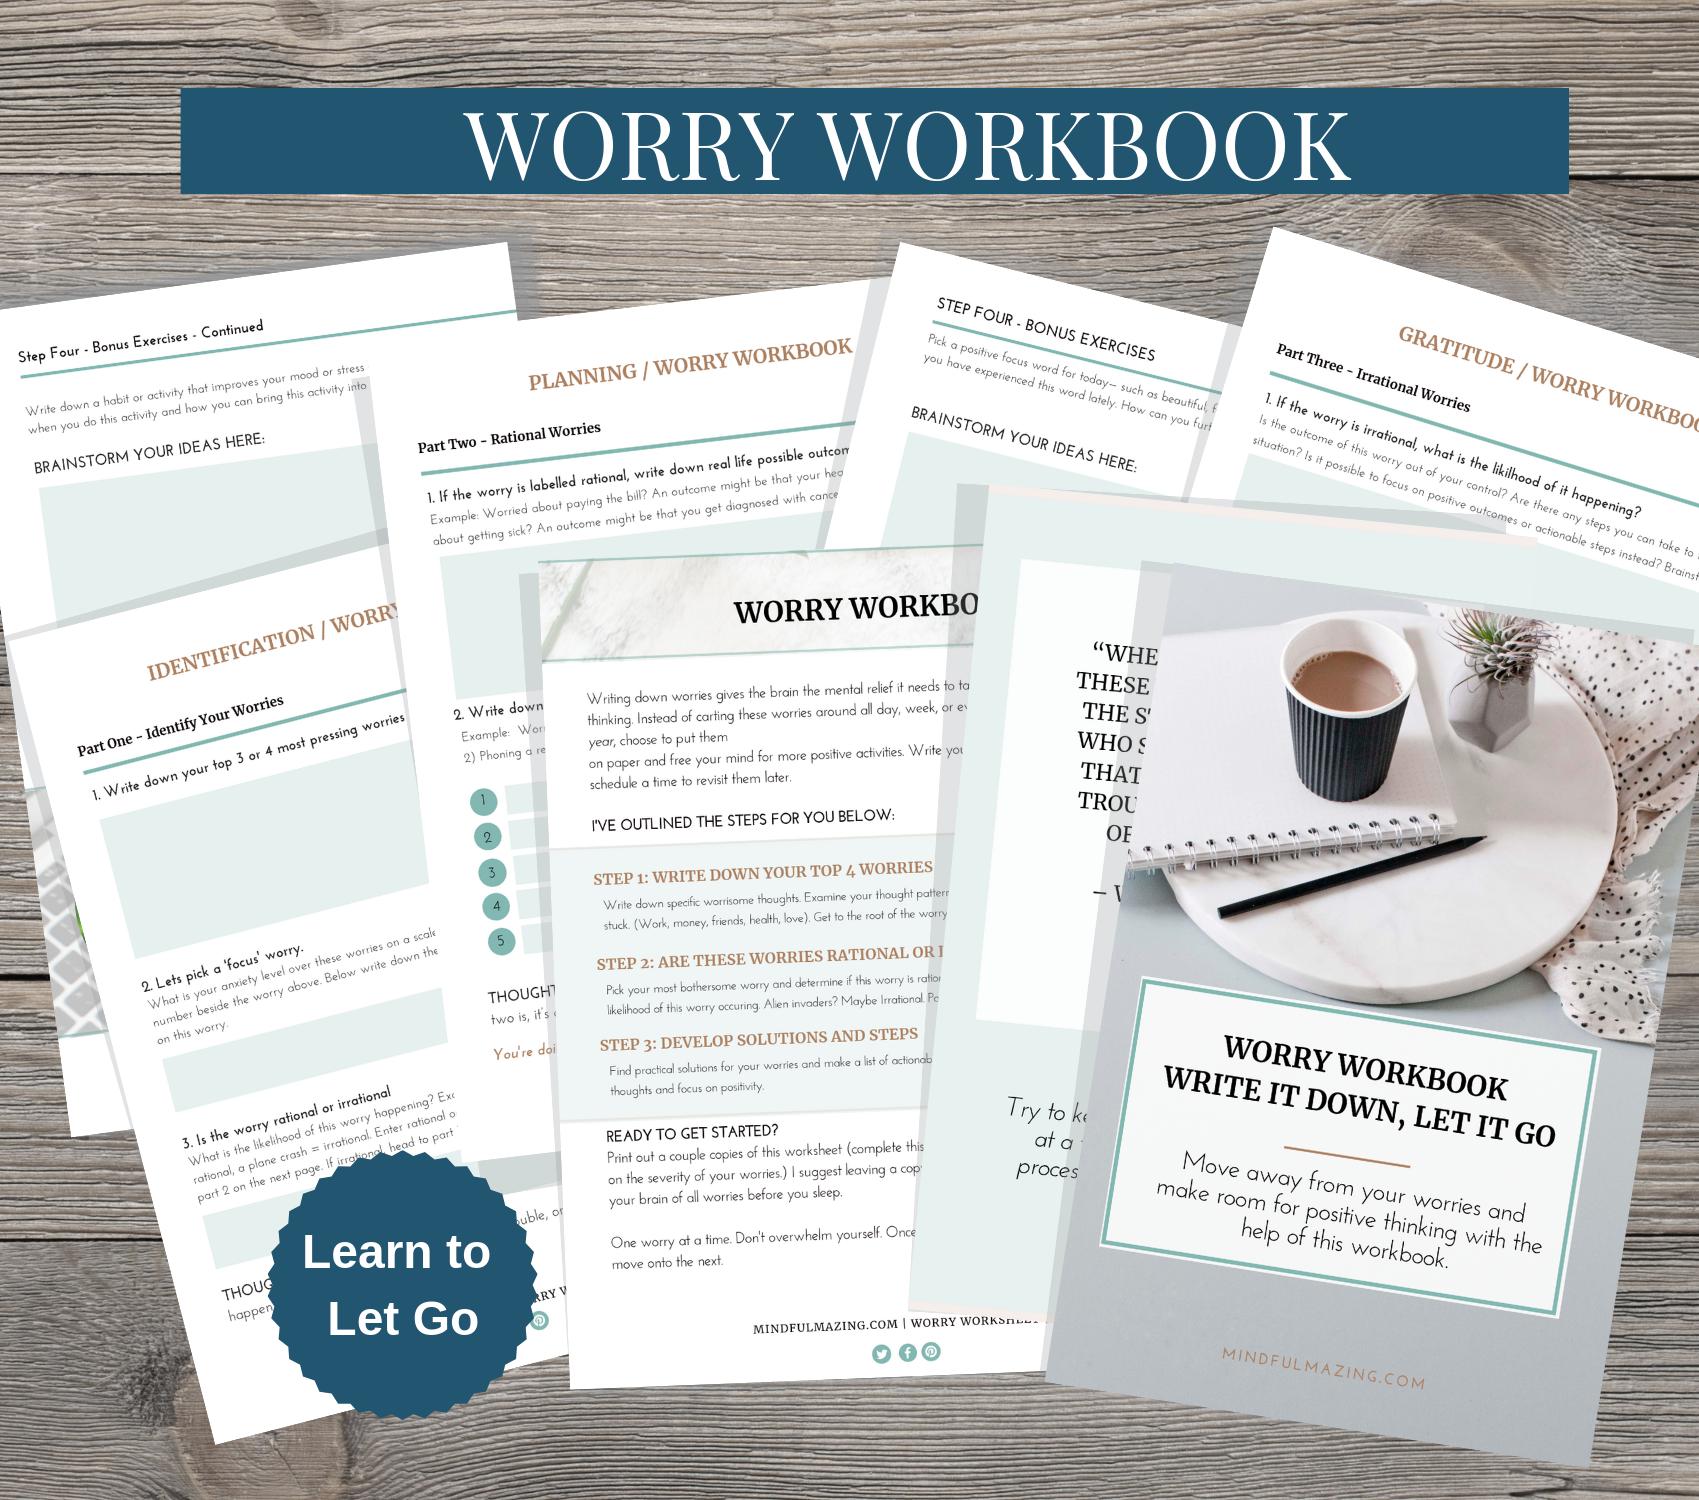 Worry Workbook In